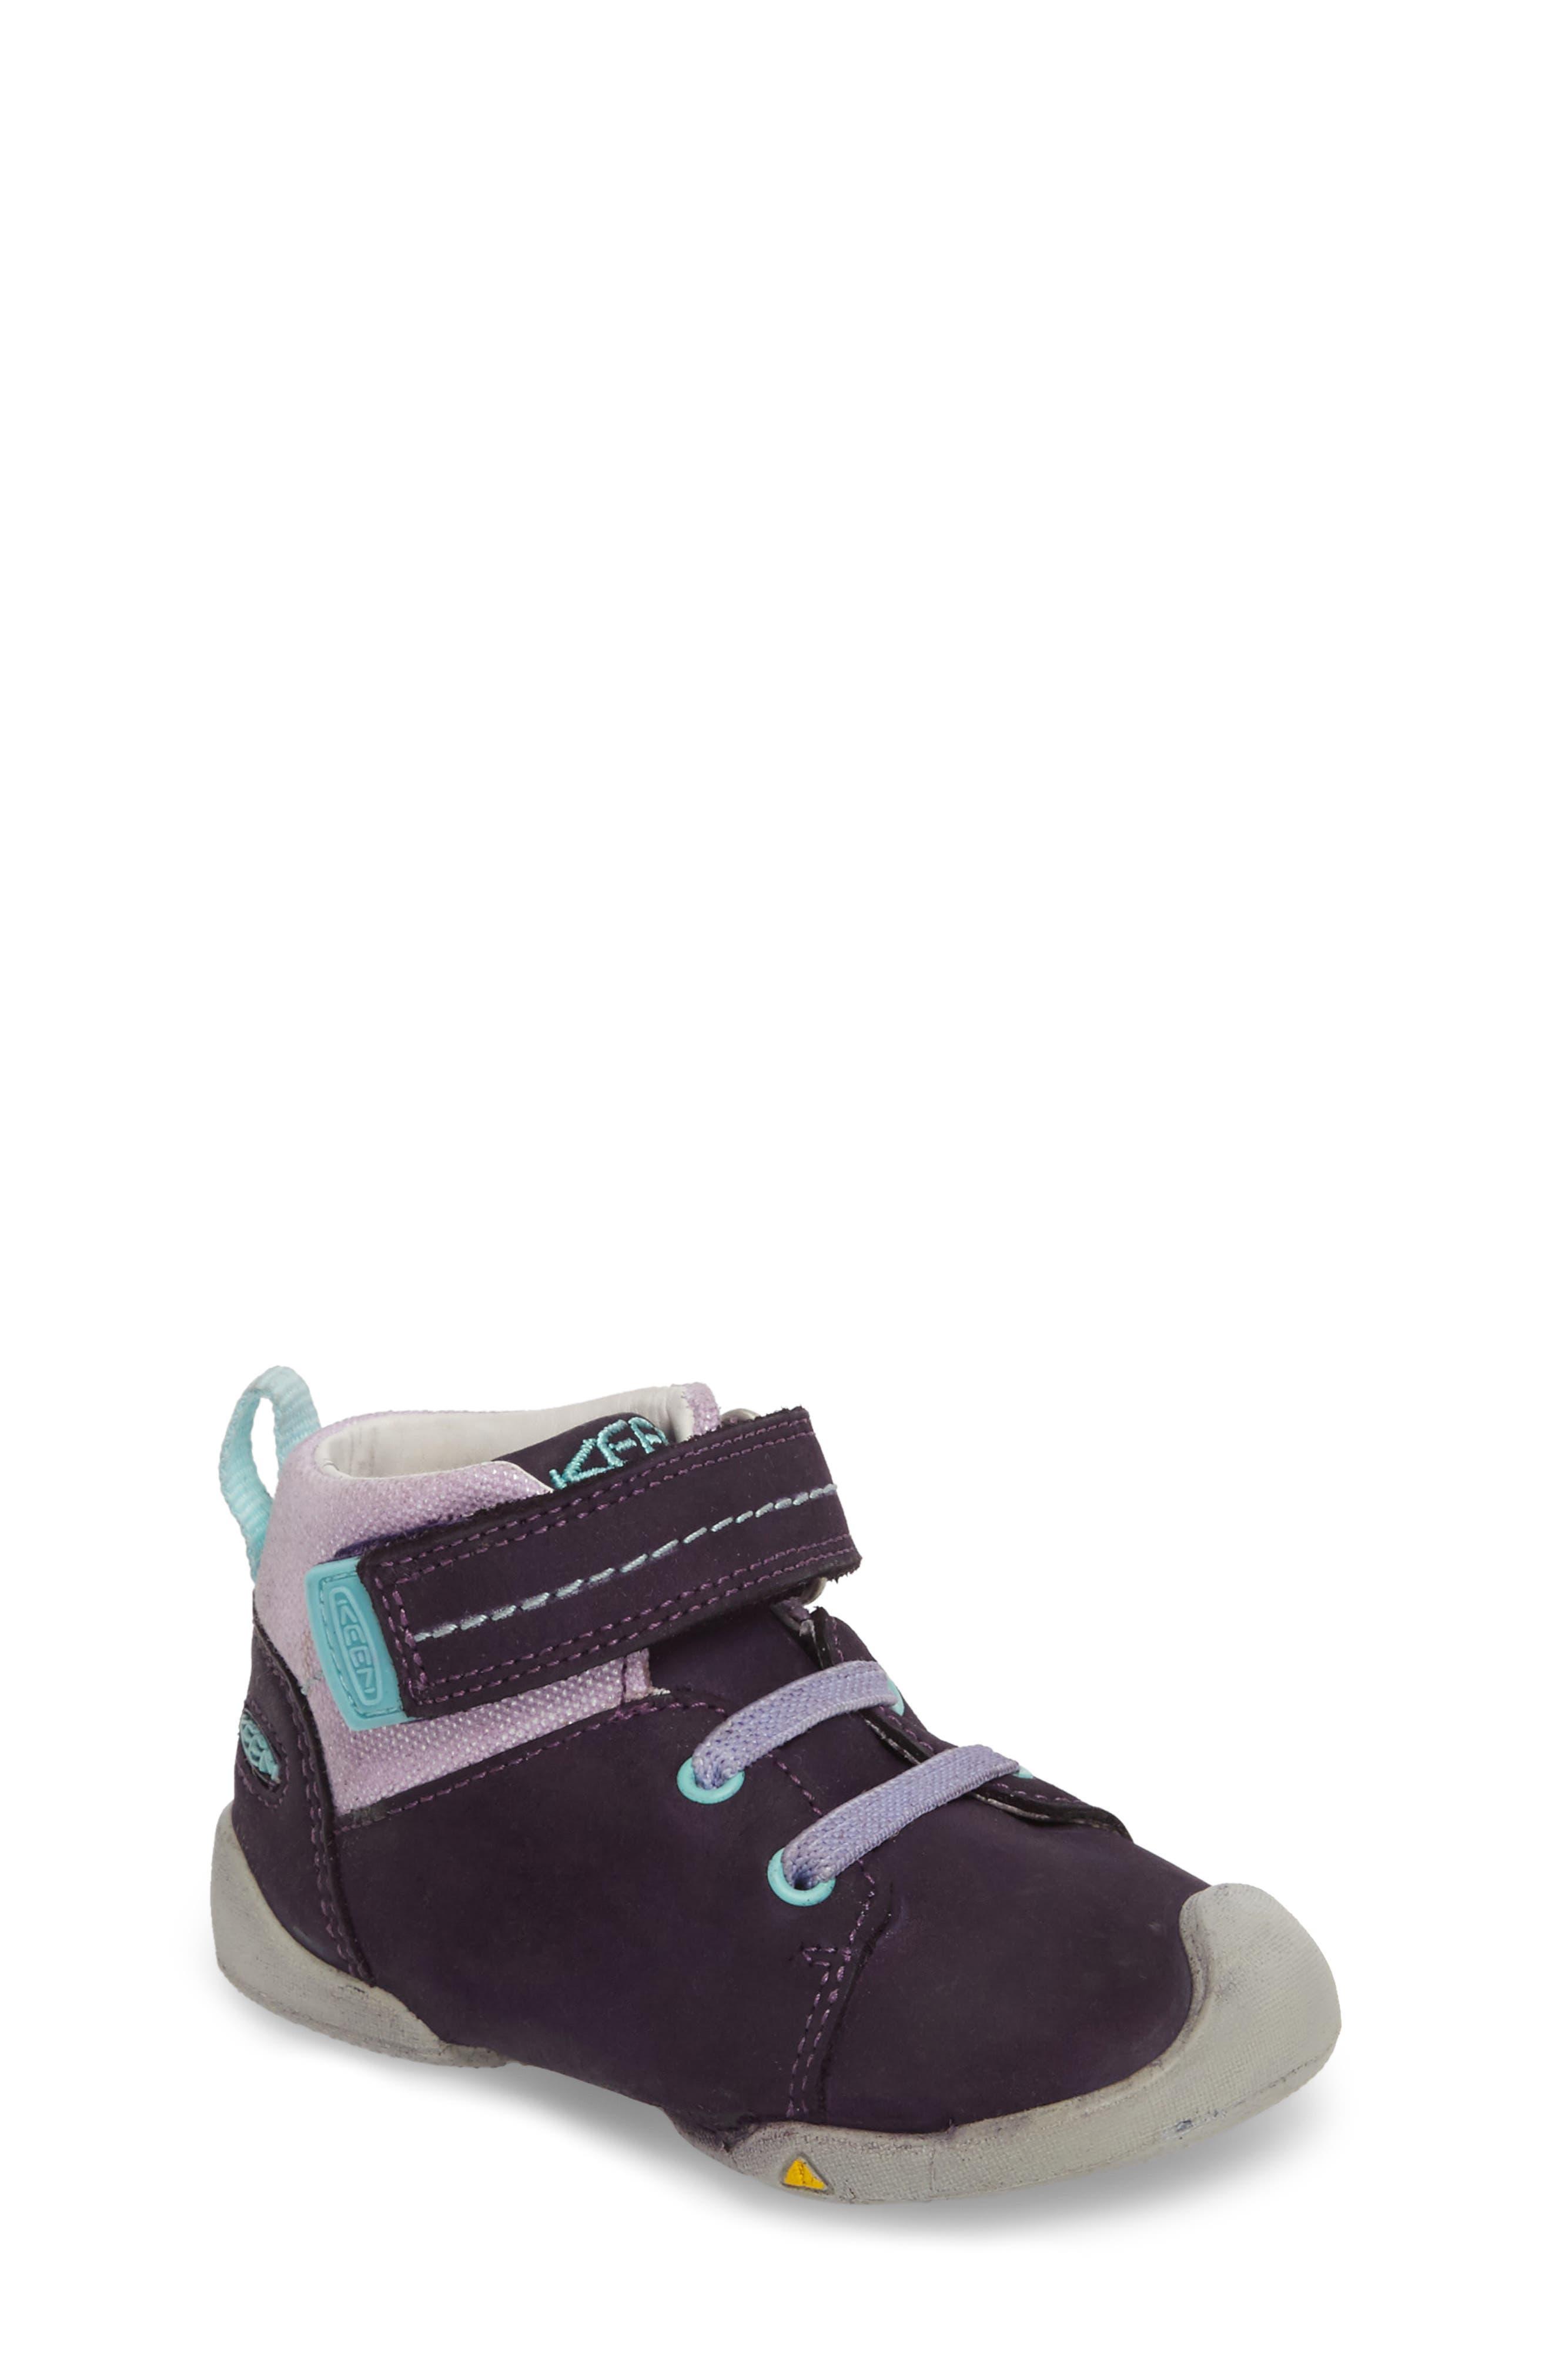 Pep Mid-T Sneaker,                         Main,                         color, Plumeria/ Sweet Lavendar